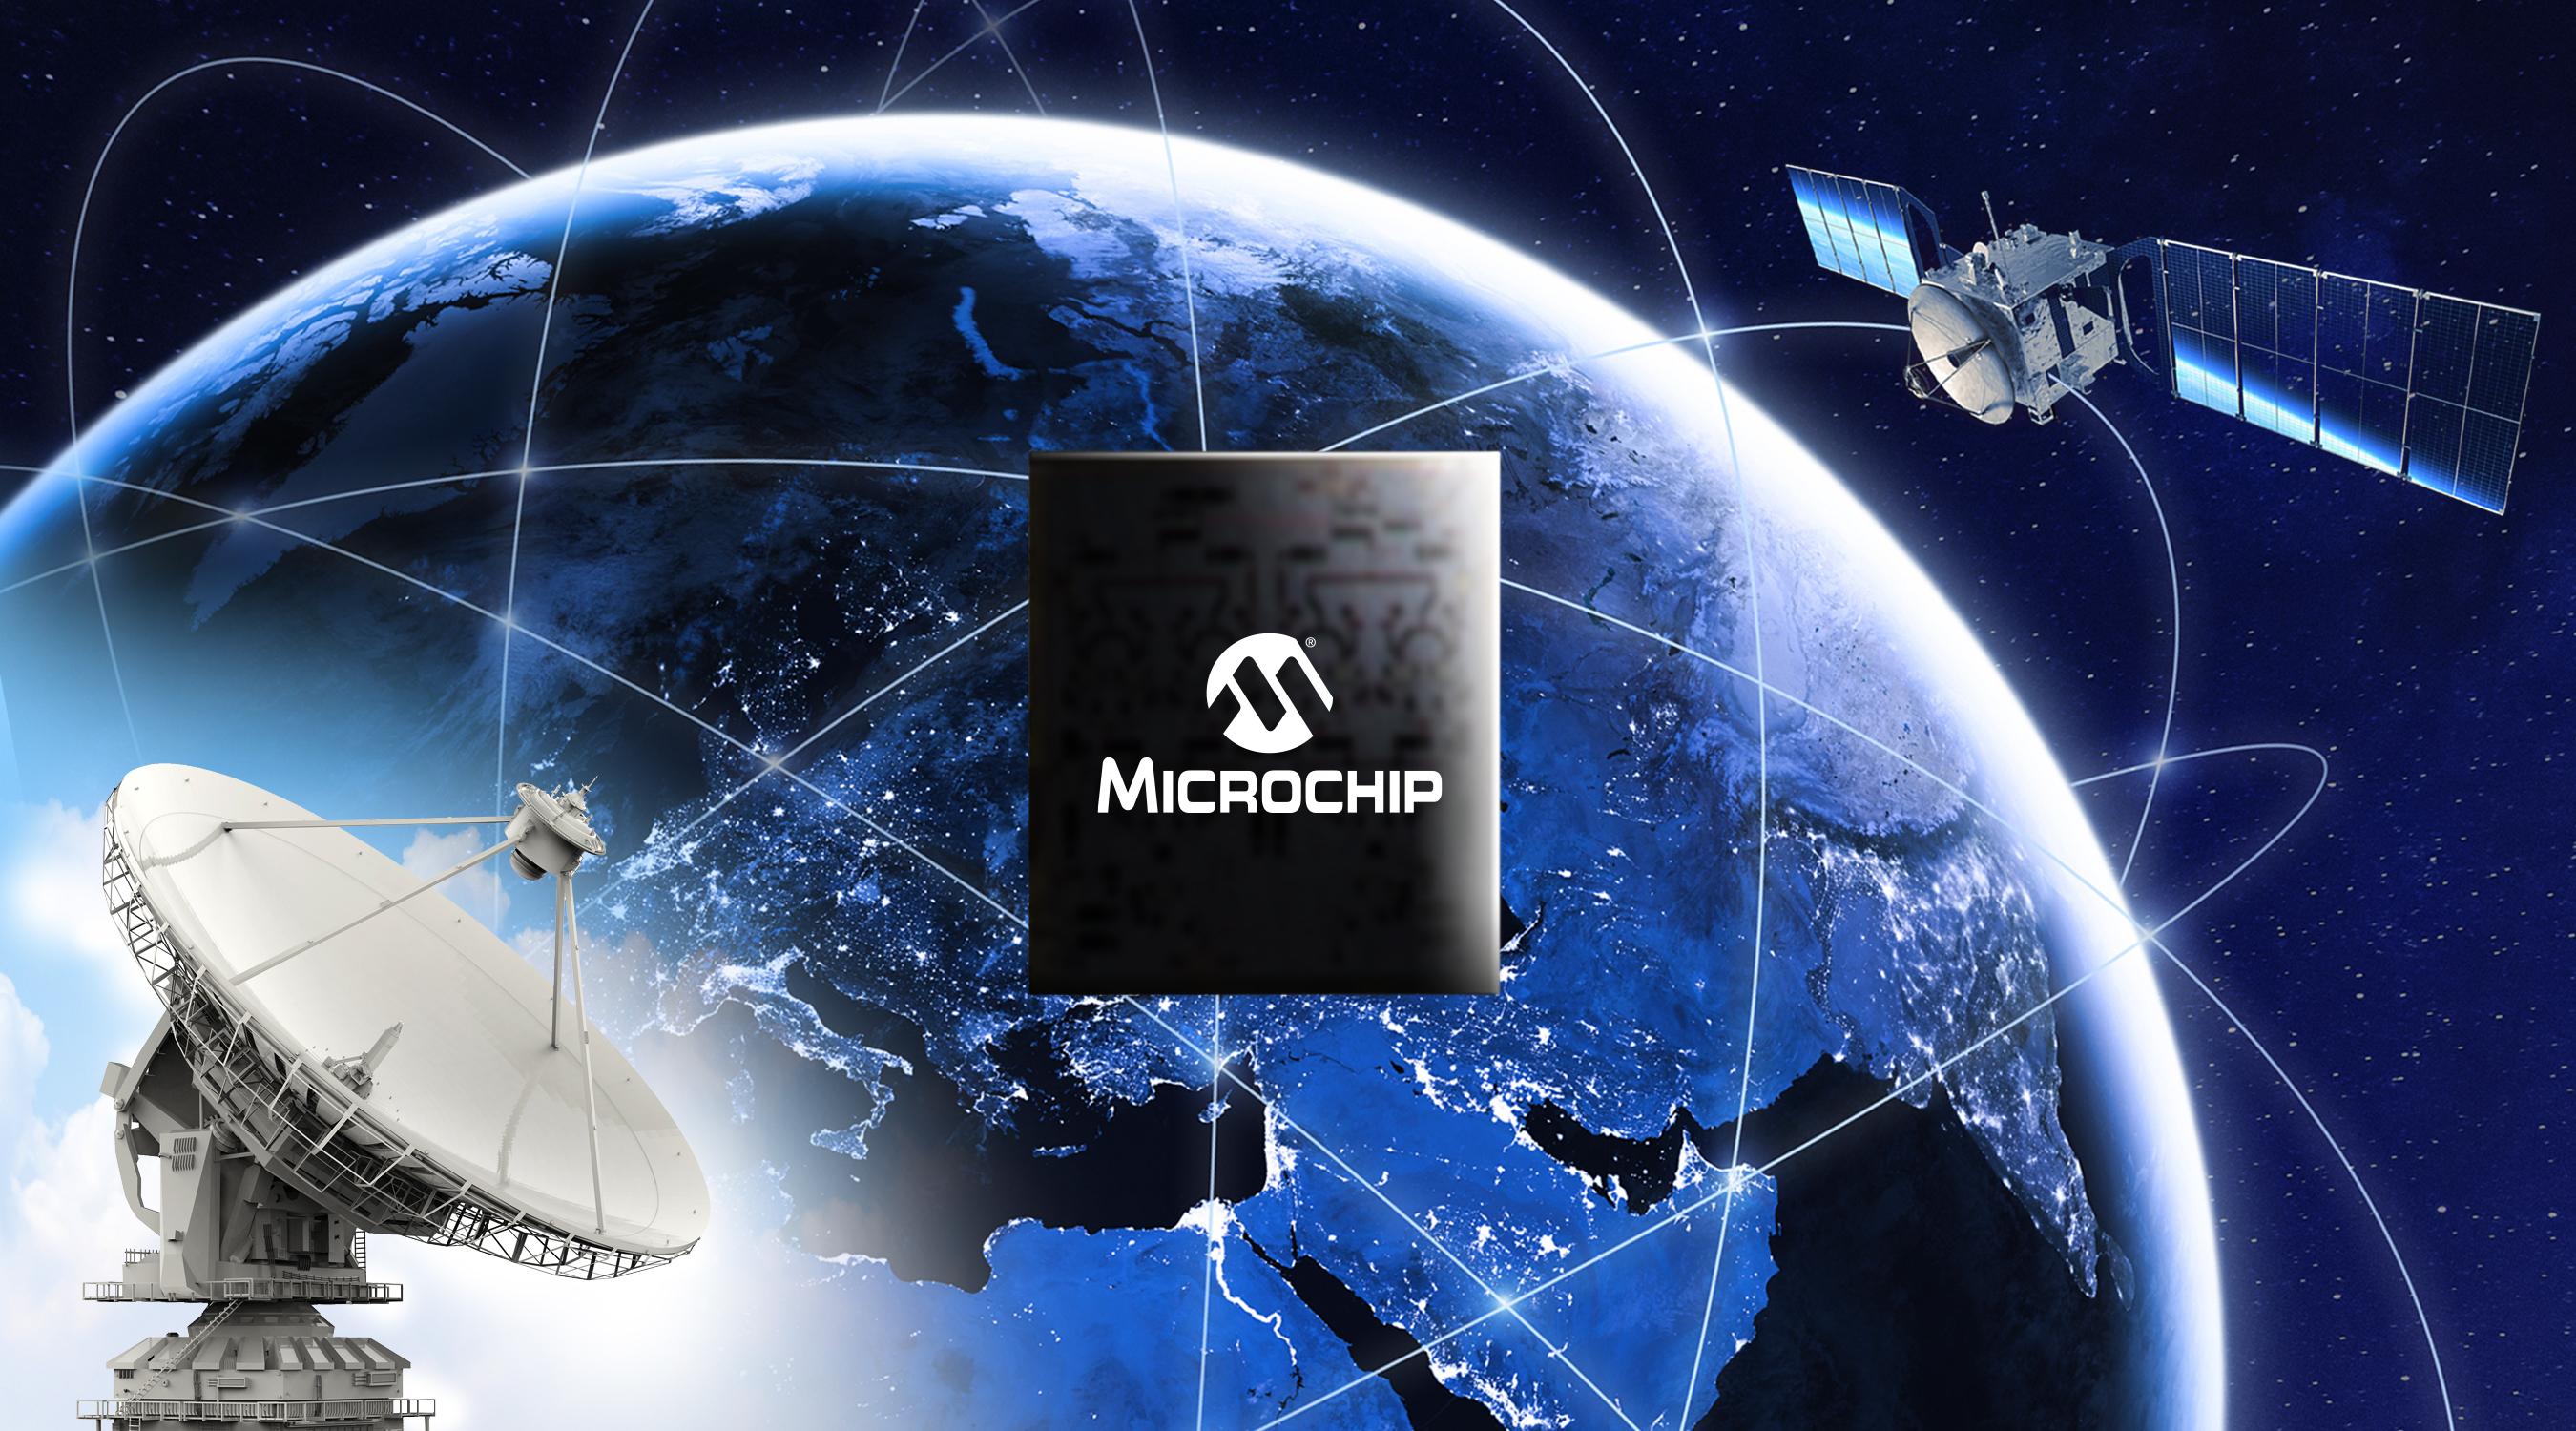 Microchip推出用于卫星通信终端的高线性度Ka波段单片微波集成电路(MMIC),进一步丰富氮化镓(GaN)射频产品组合